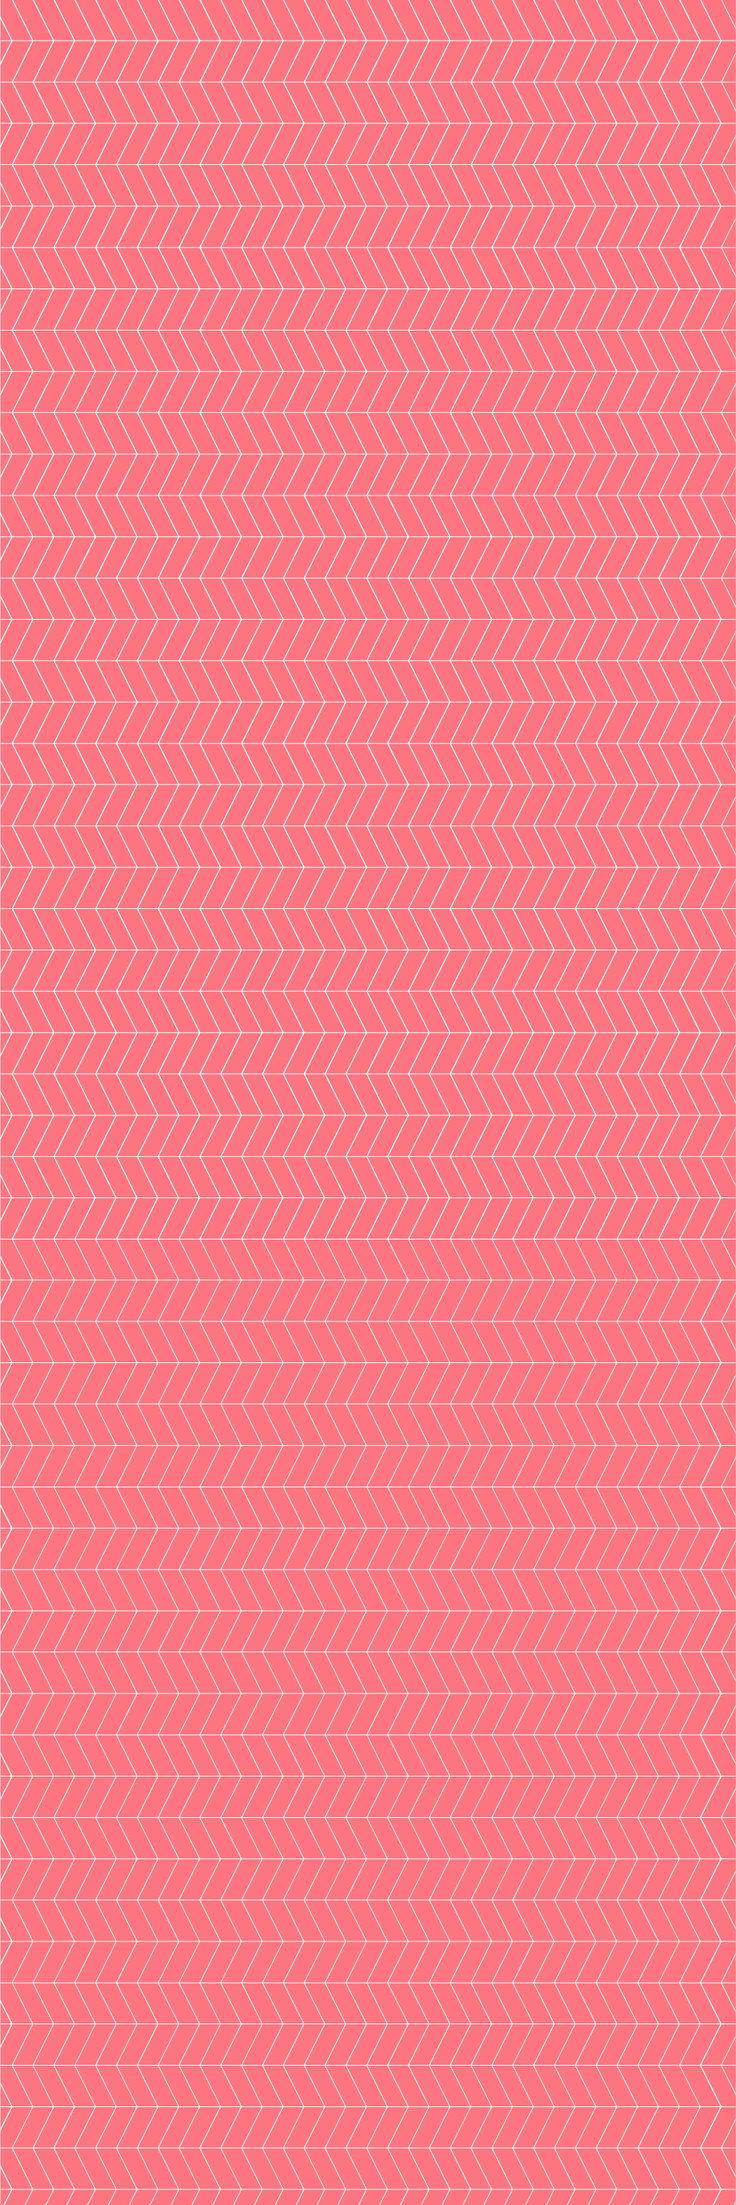 Custom printed Herringbone wallpaper from the 'CONFIDENT' colour range #herringbone #wallpaper #muurgraphics